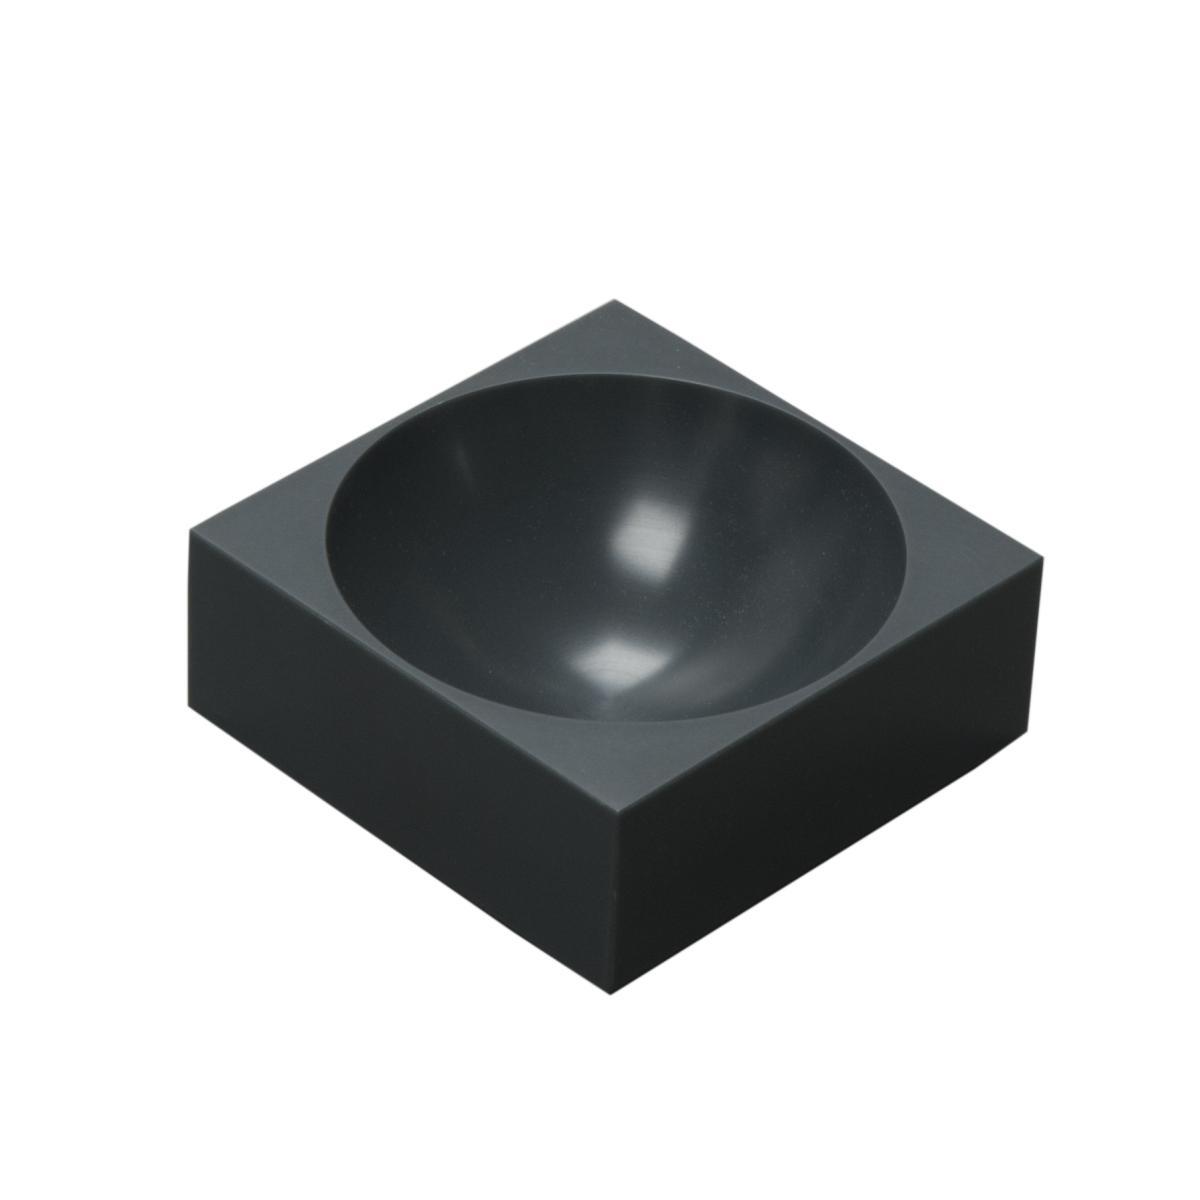 farmer block Magnet-Schale 8 x 8 cm, Urban schwarz